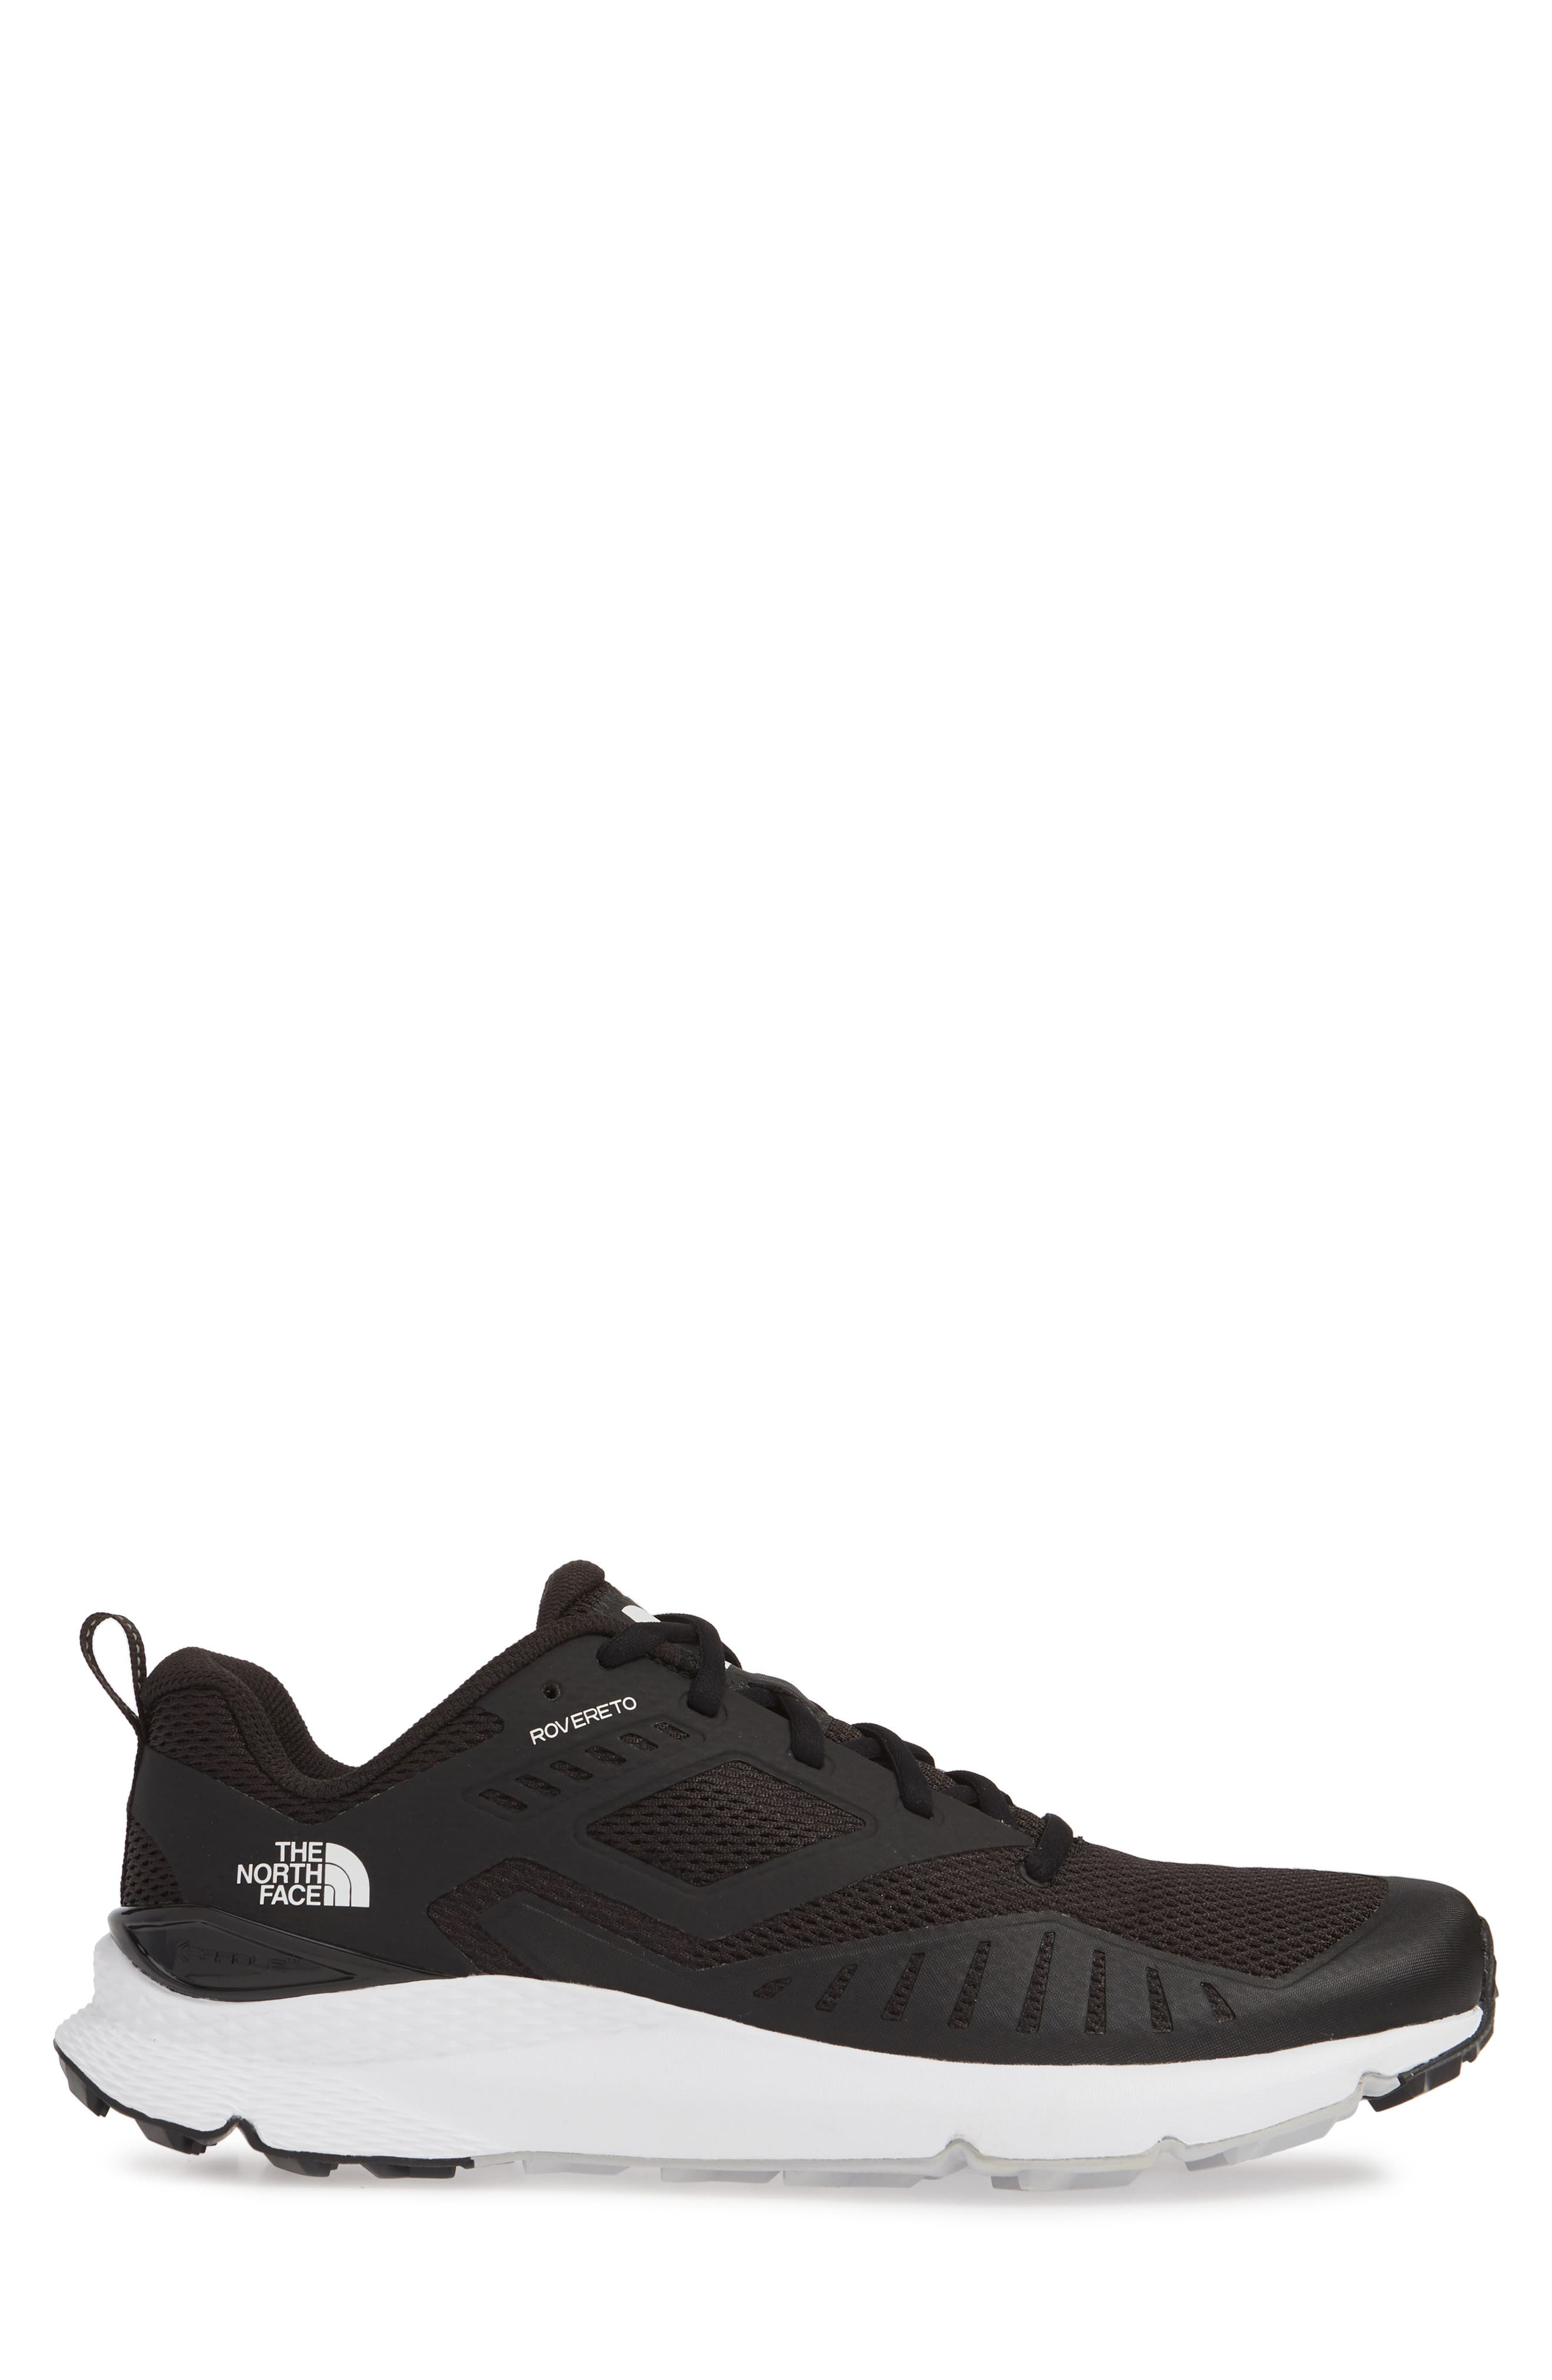 THE NORTH FACE, Rovereto Running Shoe, Alternate thumbnail 3, color, BLACK/ WHITE